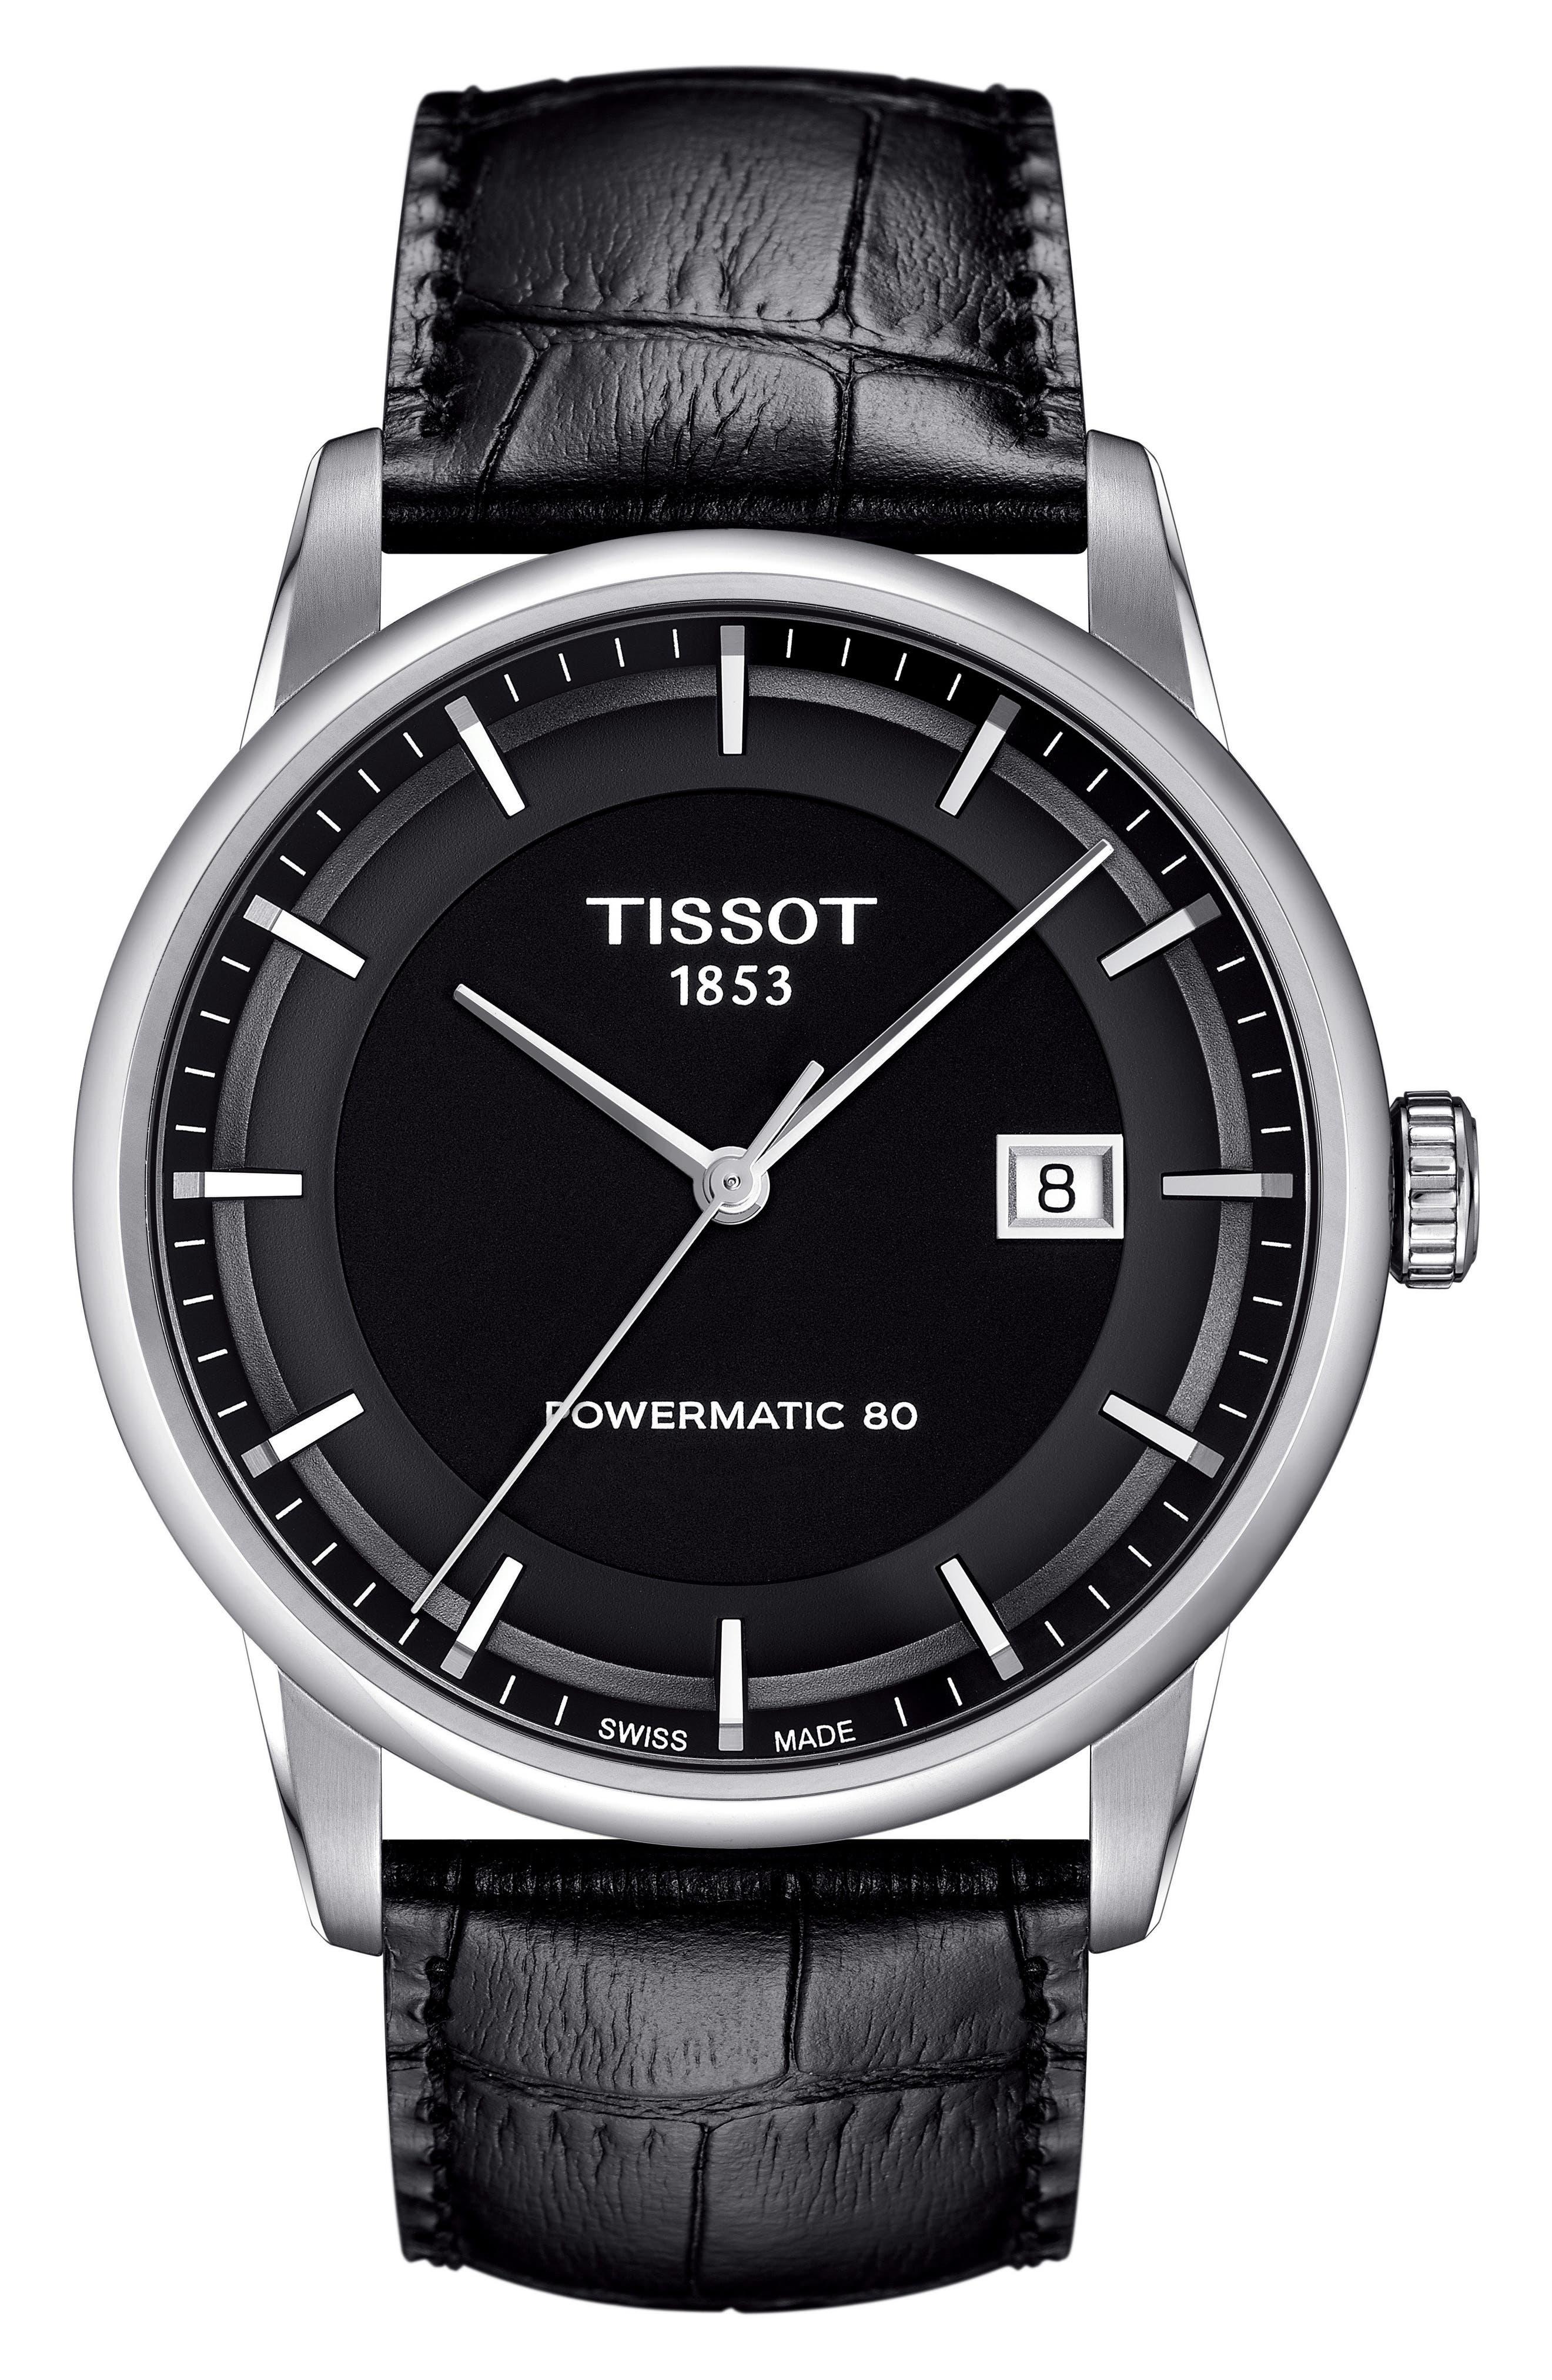 Image of Tissot Men's Luxury Powermatic 80 Croc Embossed Leather Strap Watch, 41mm